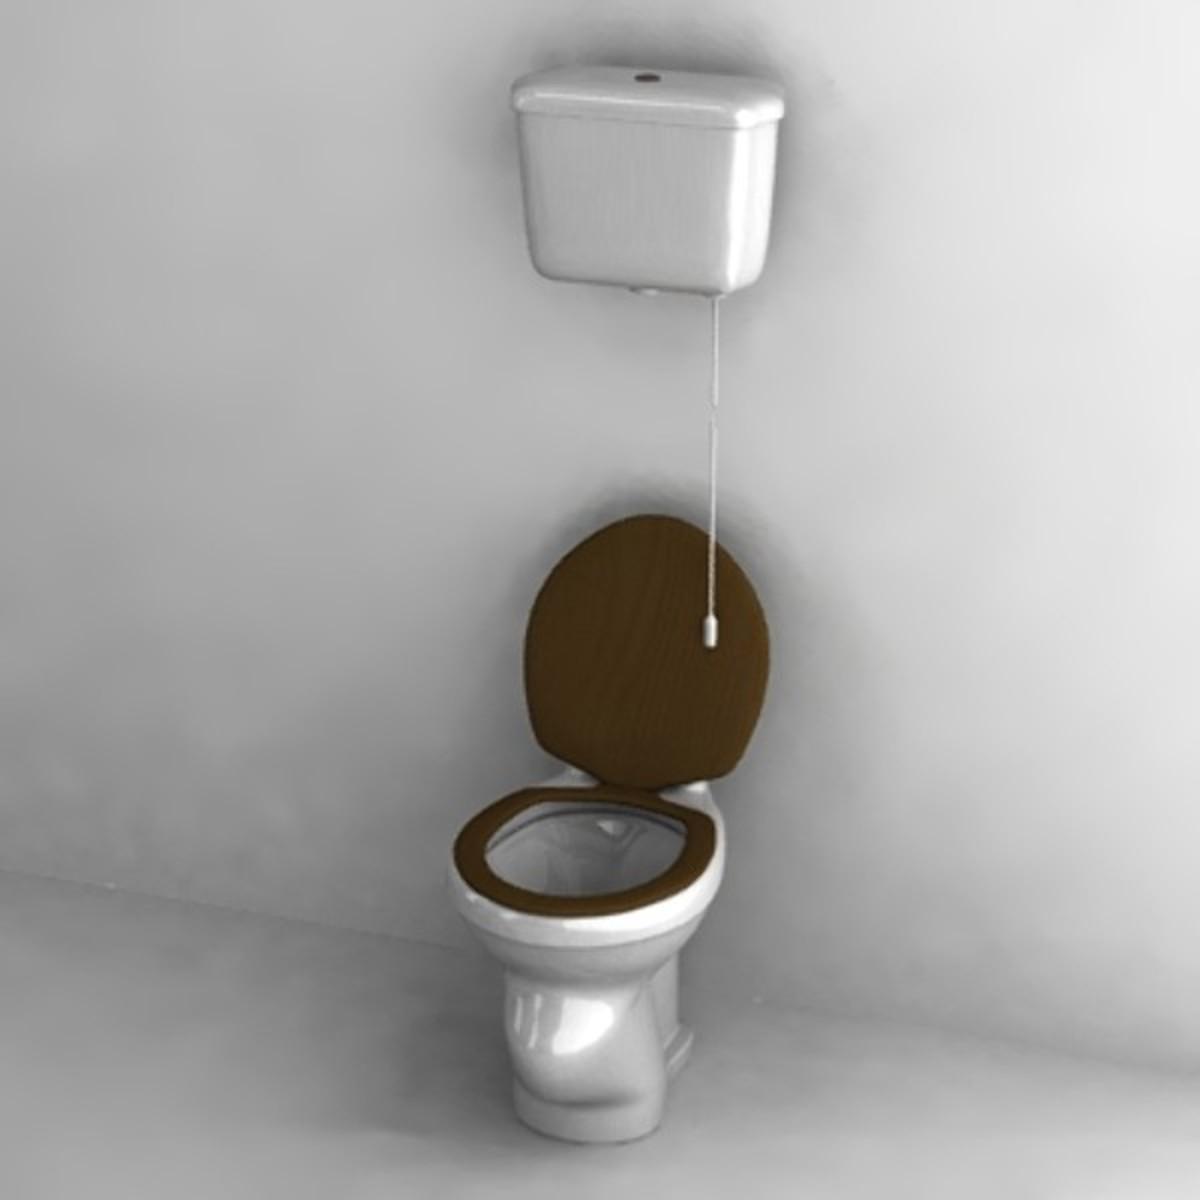 A typical Dutch toilet